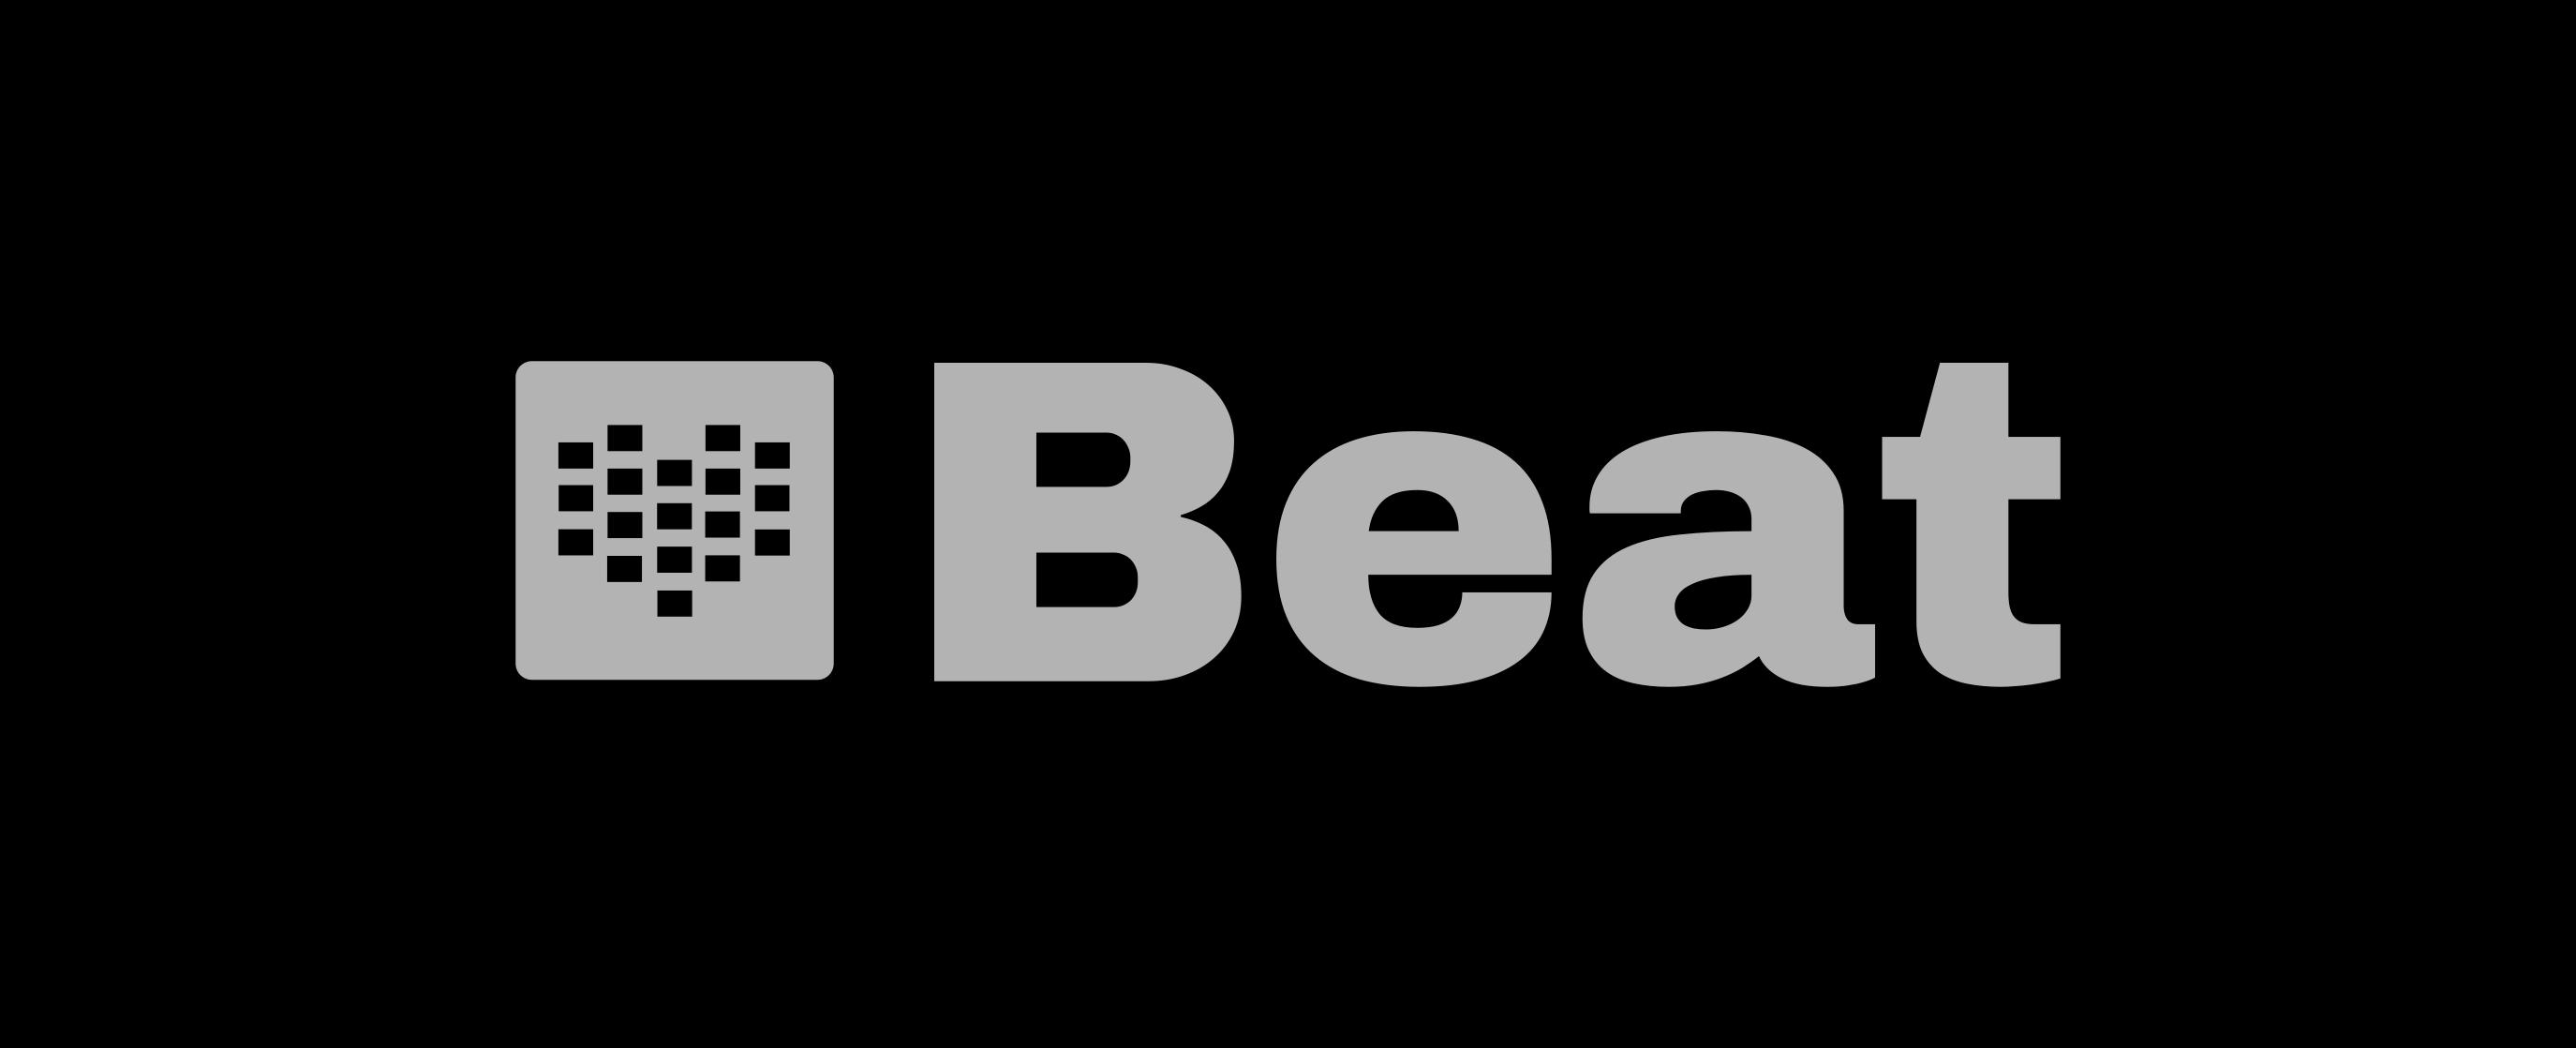 assets/beat-banner2.png